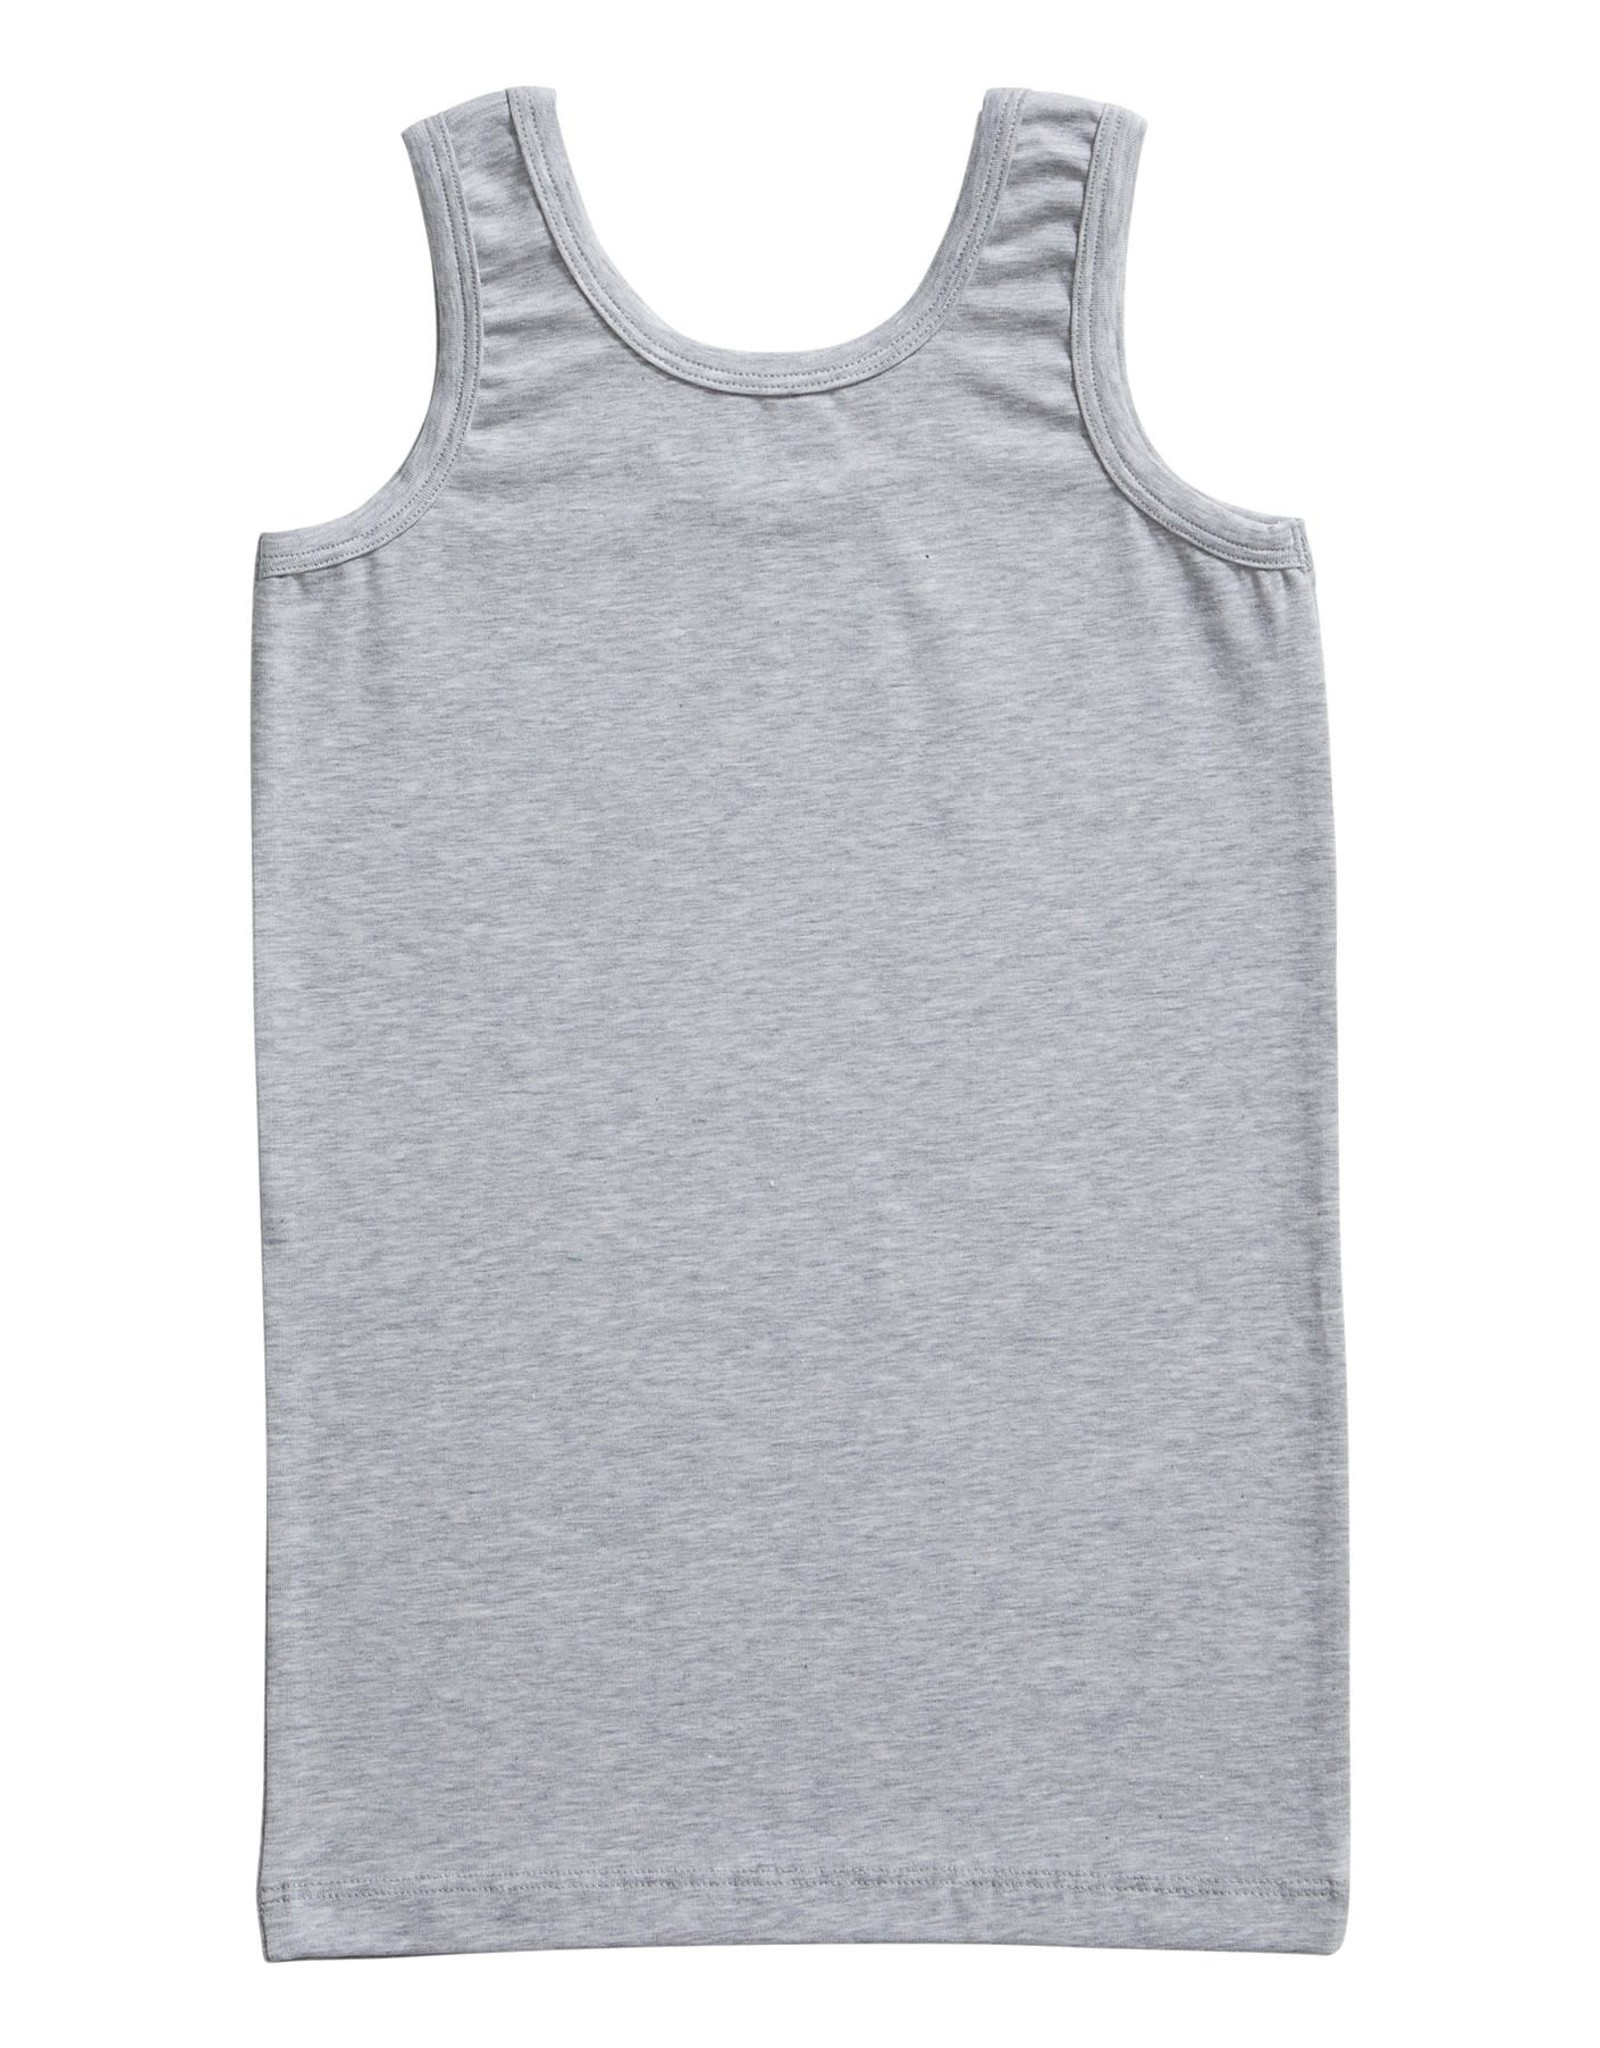 Ten Cate Basic boys shirt lightgrey melee